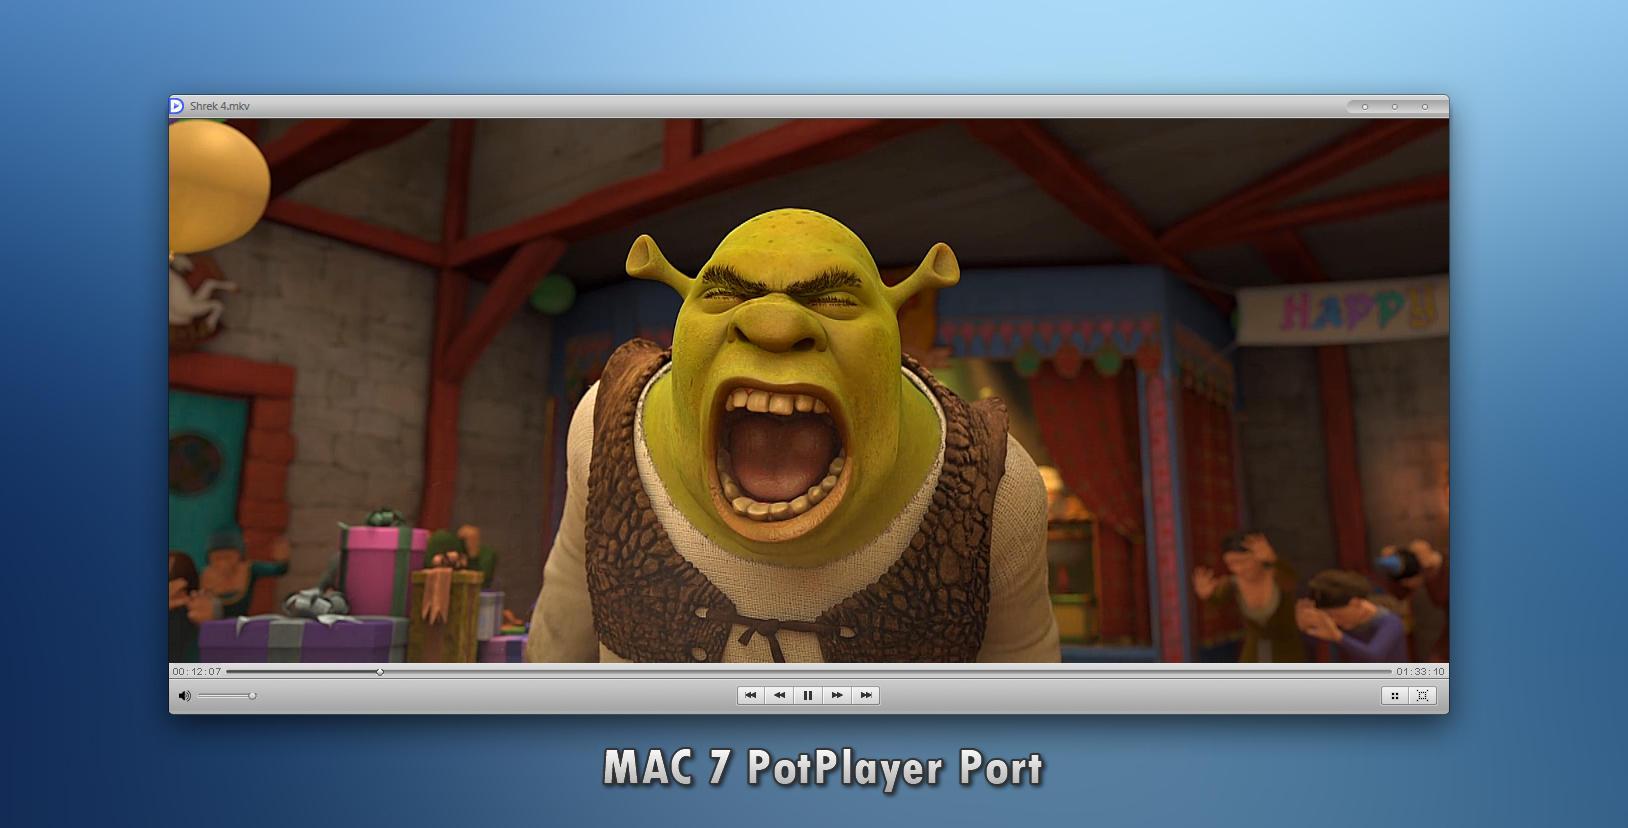 PotPlayer Mac 7 Inspirit Port by dlind87